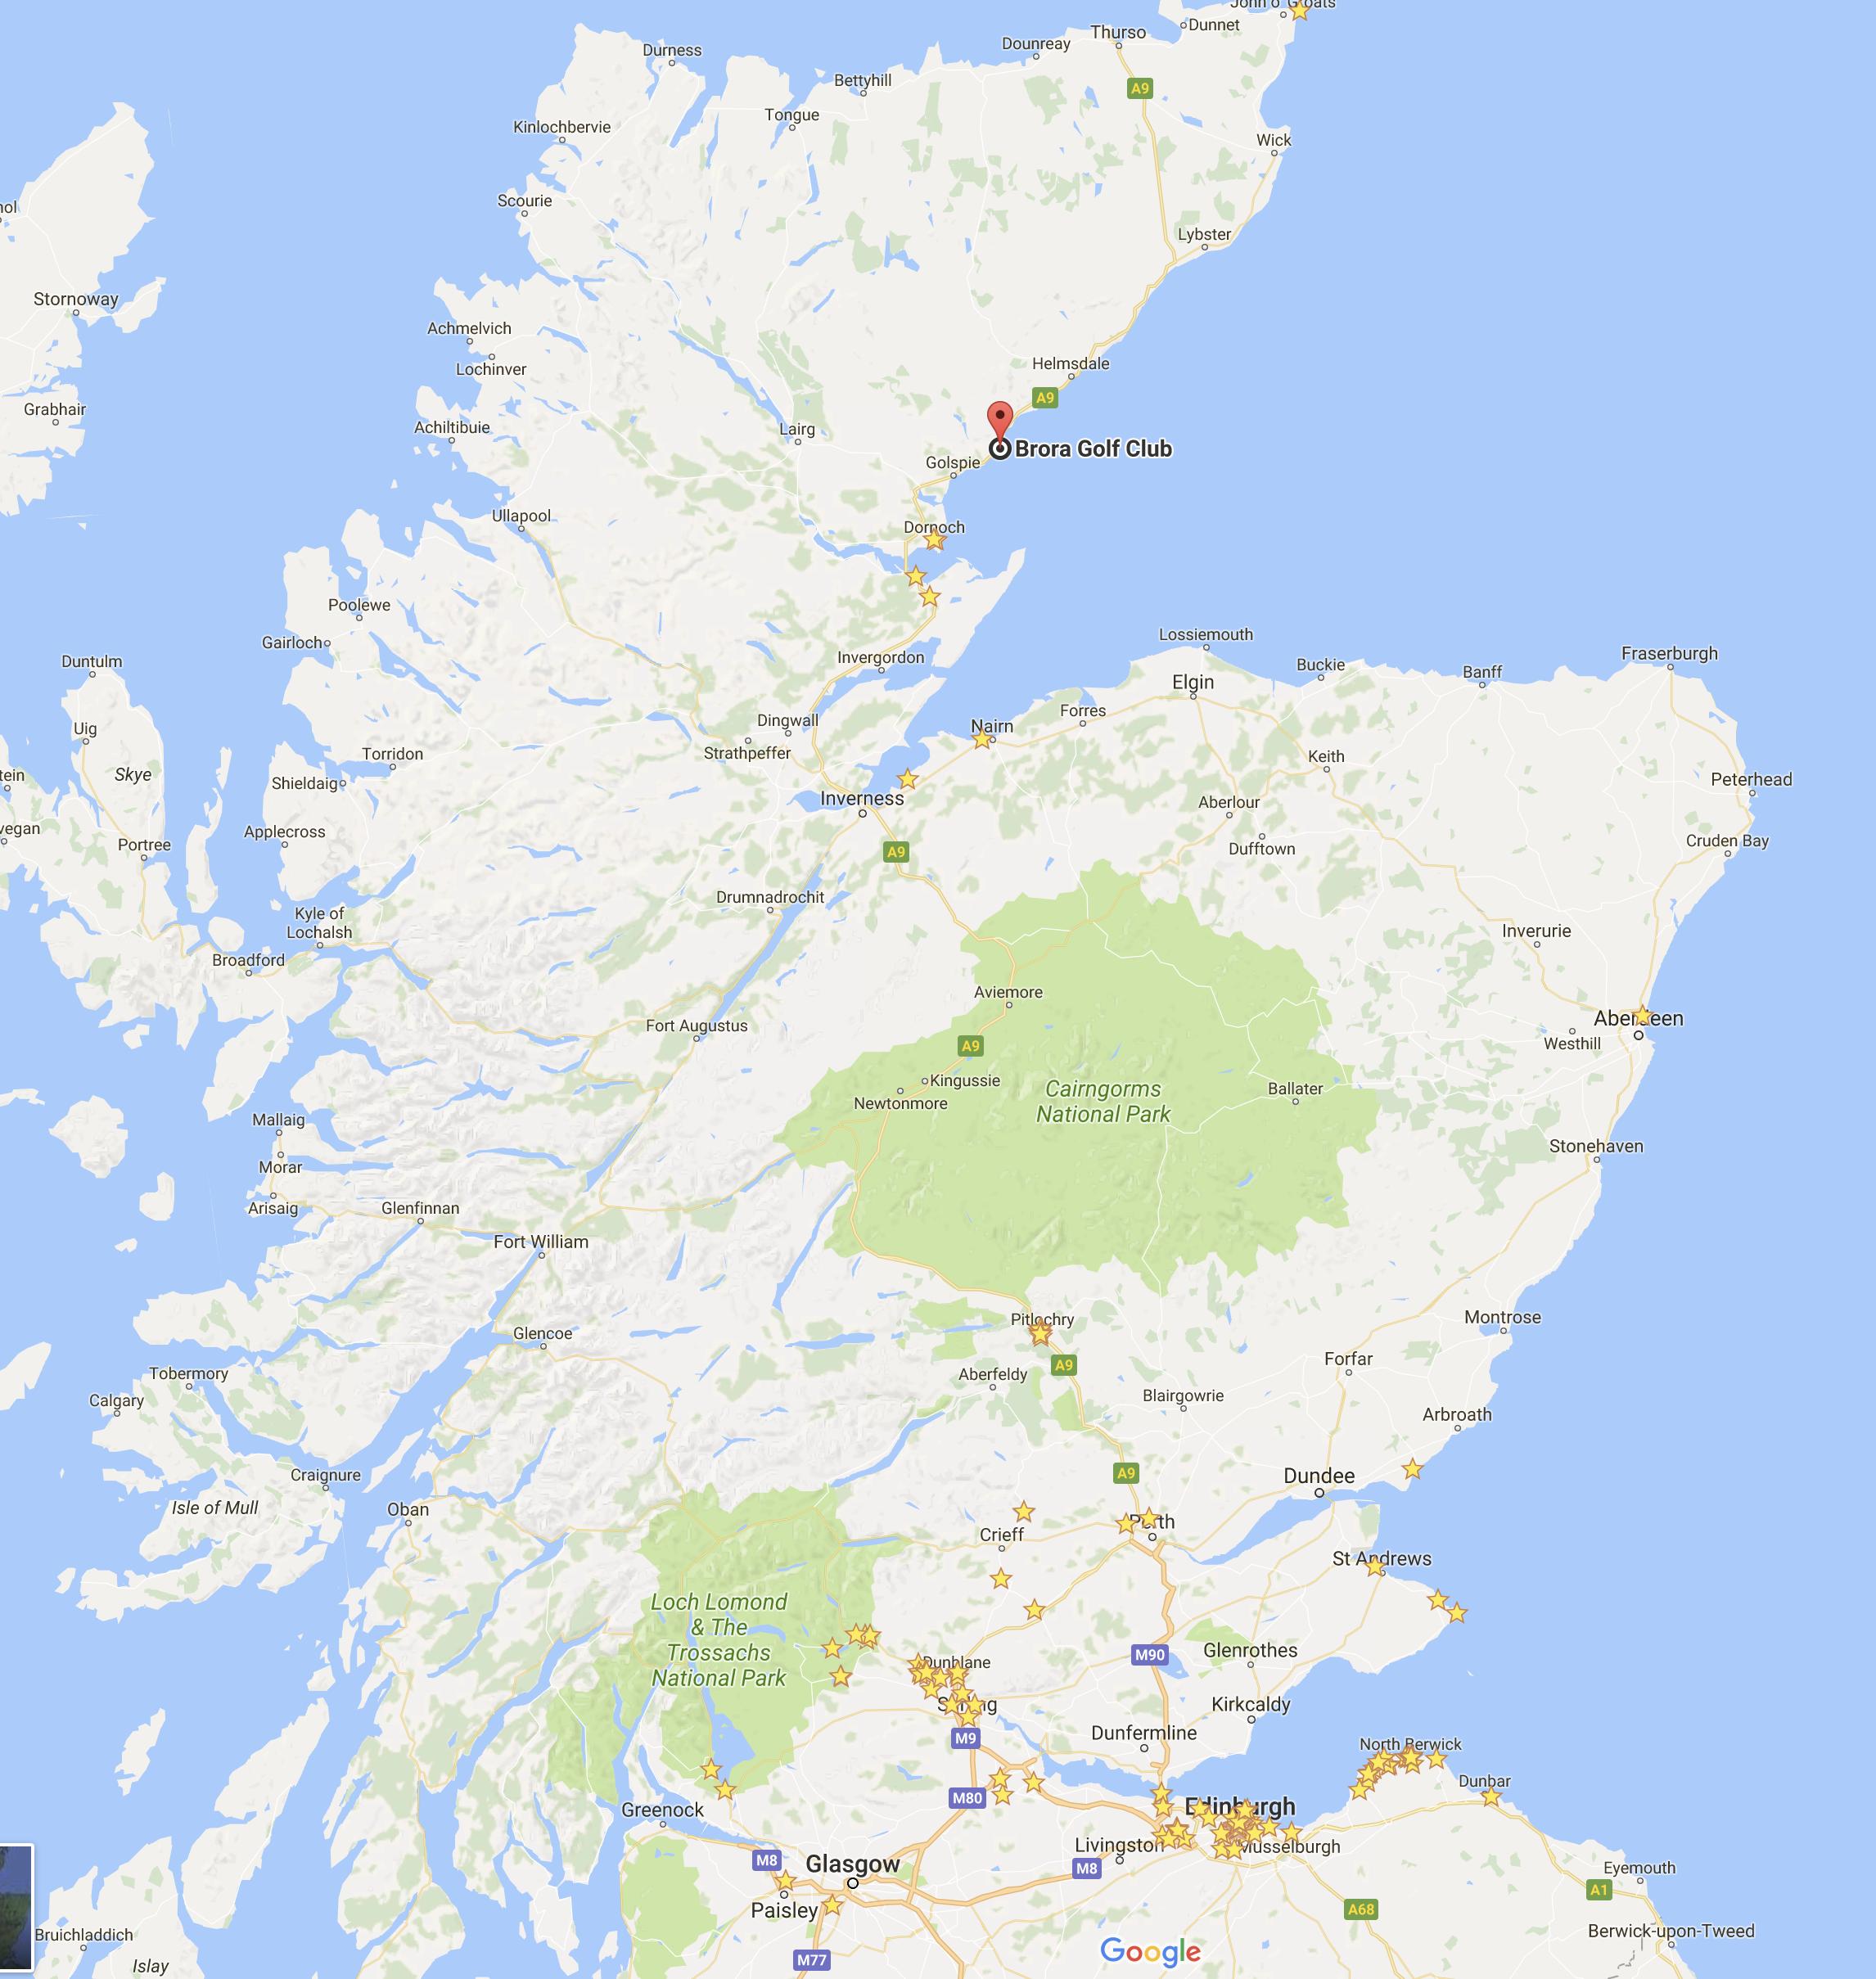 Located pretty far North. A good three hour drive from Edinburgh.